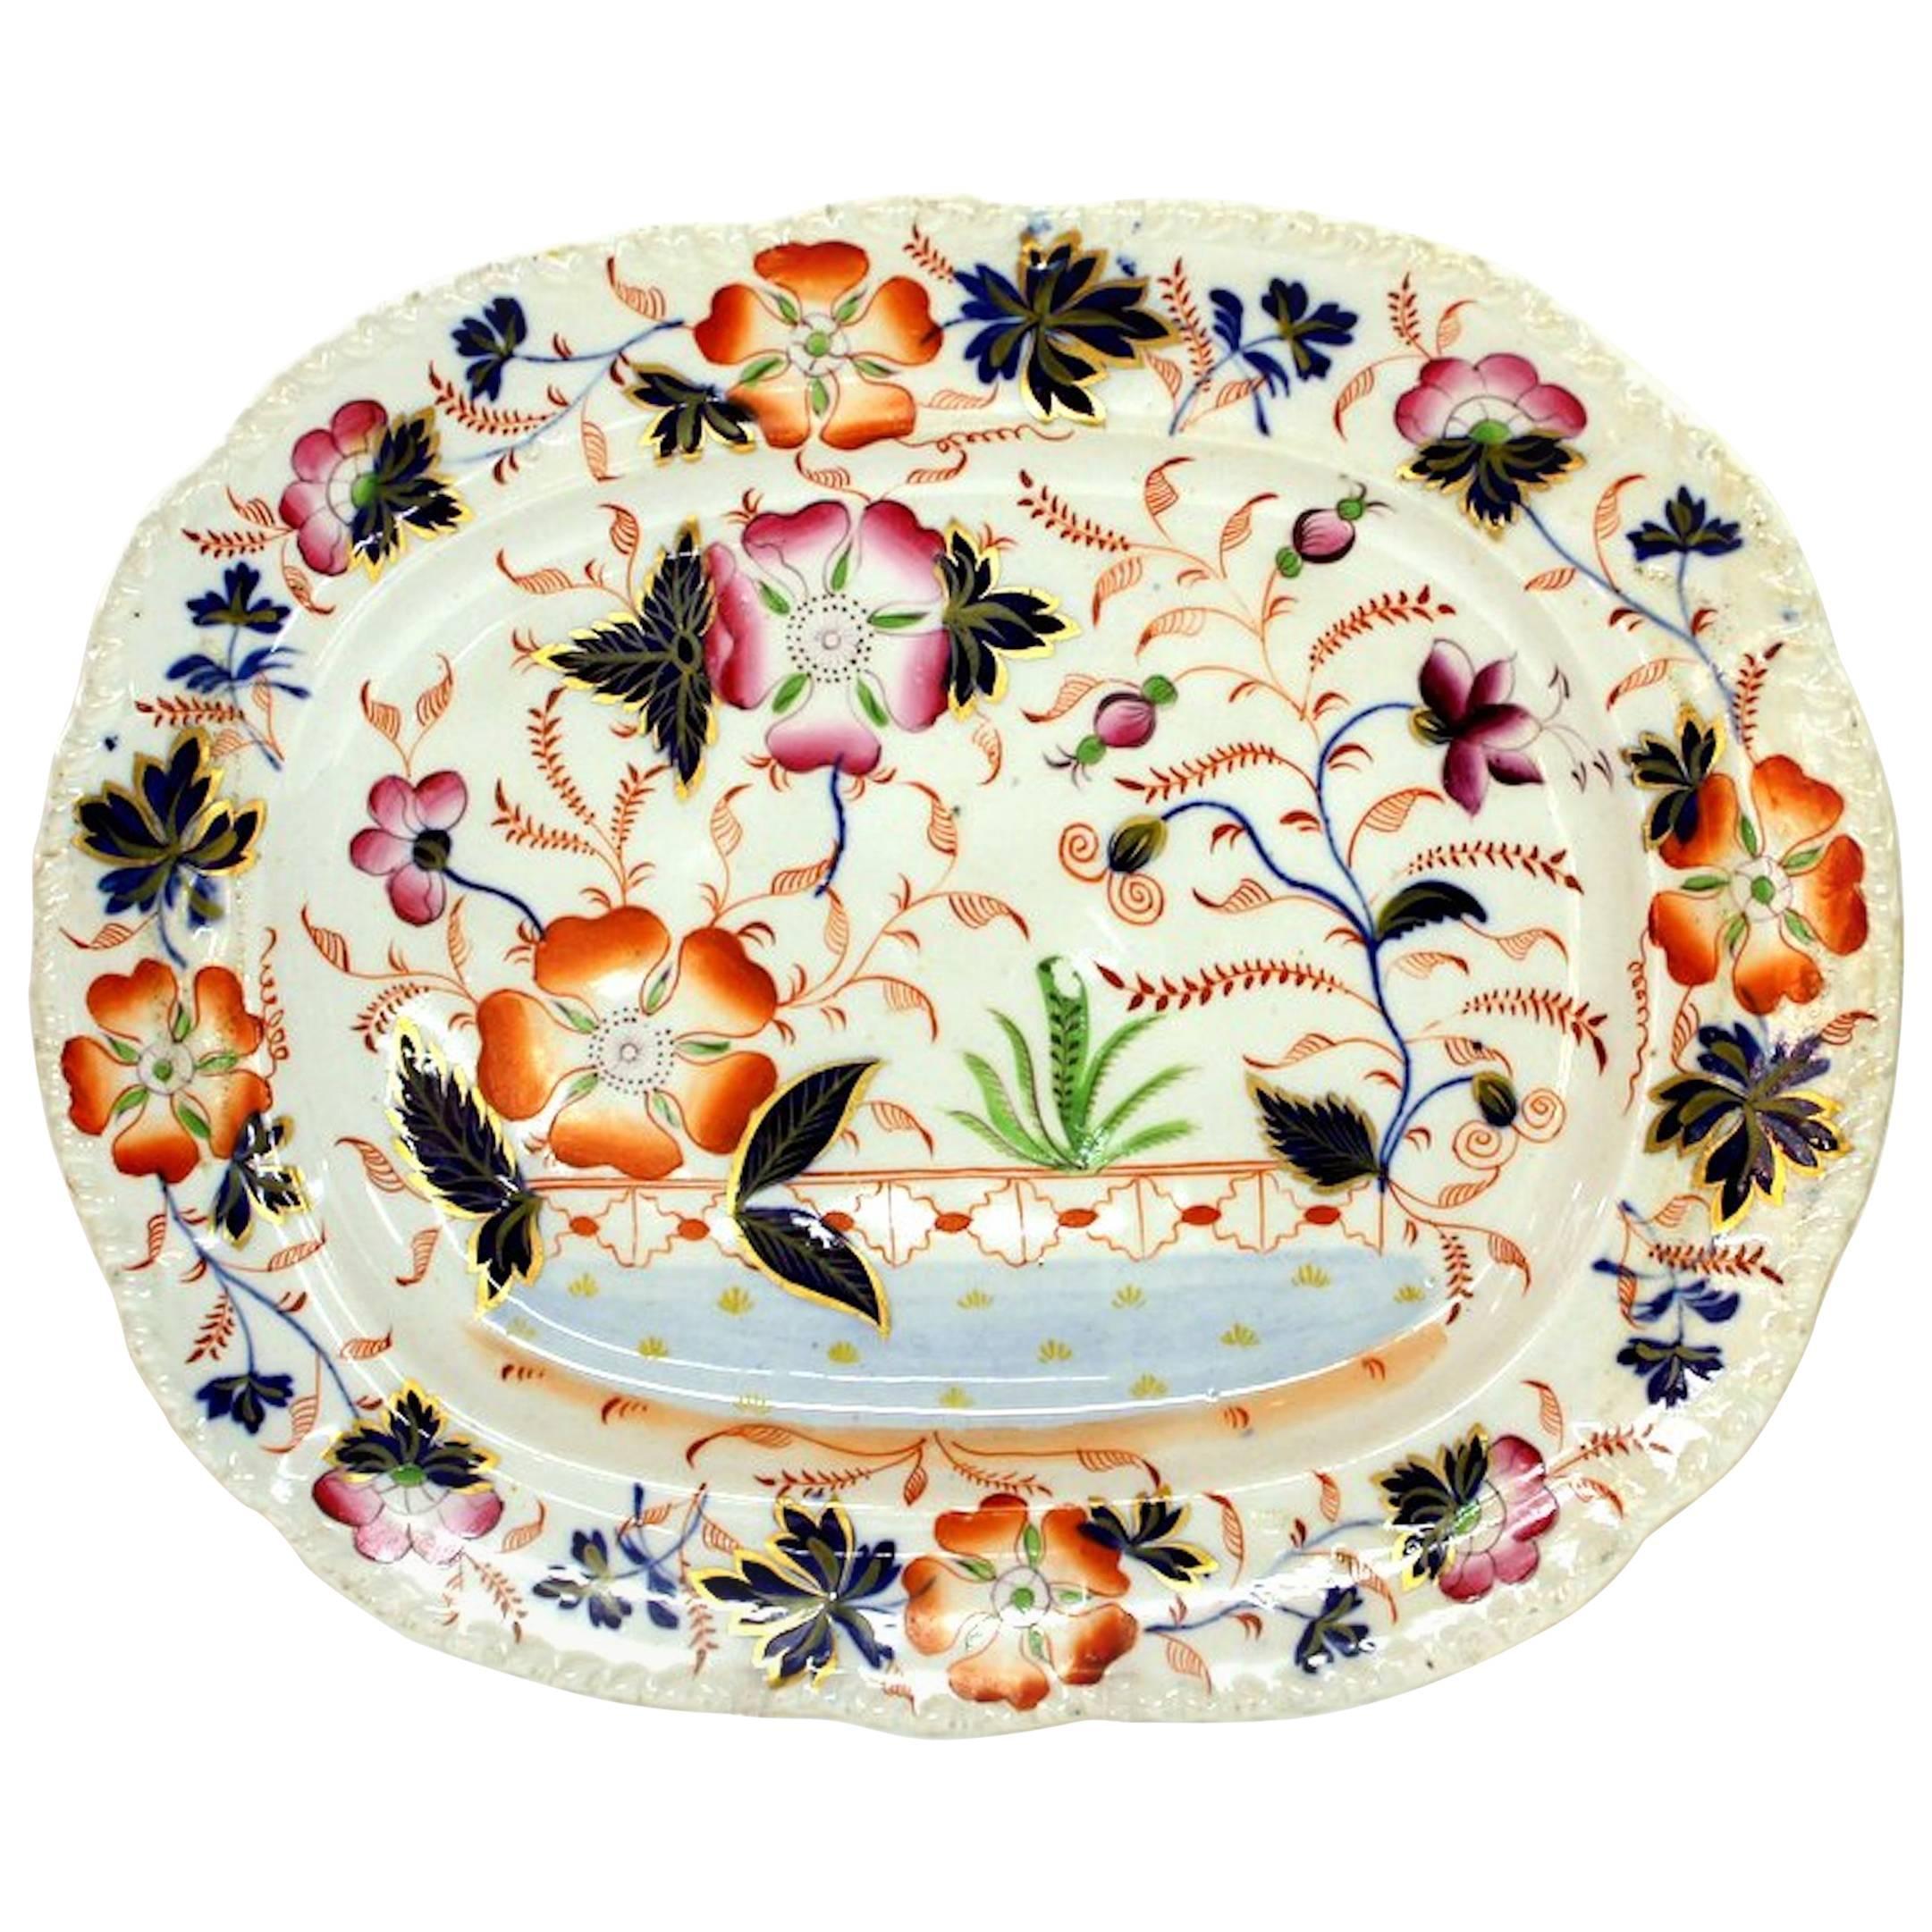 Antique English Hand-Painted Ridgway Ironstone Imari Decor Platter